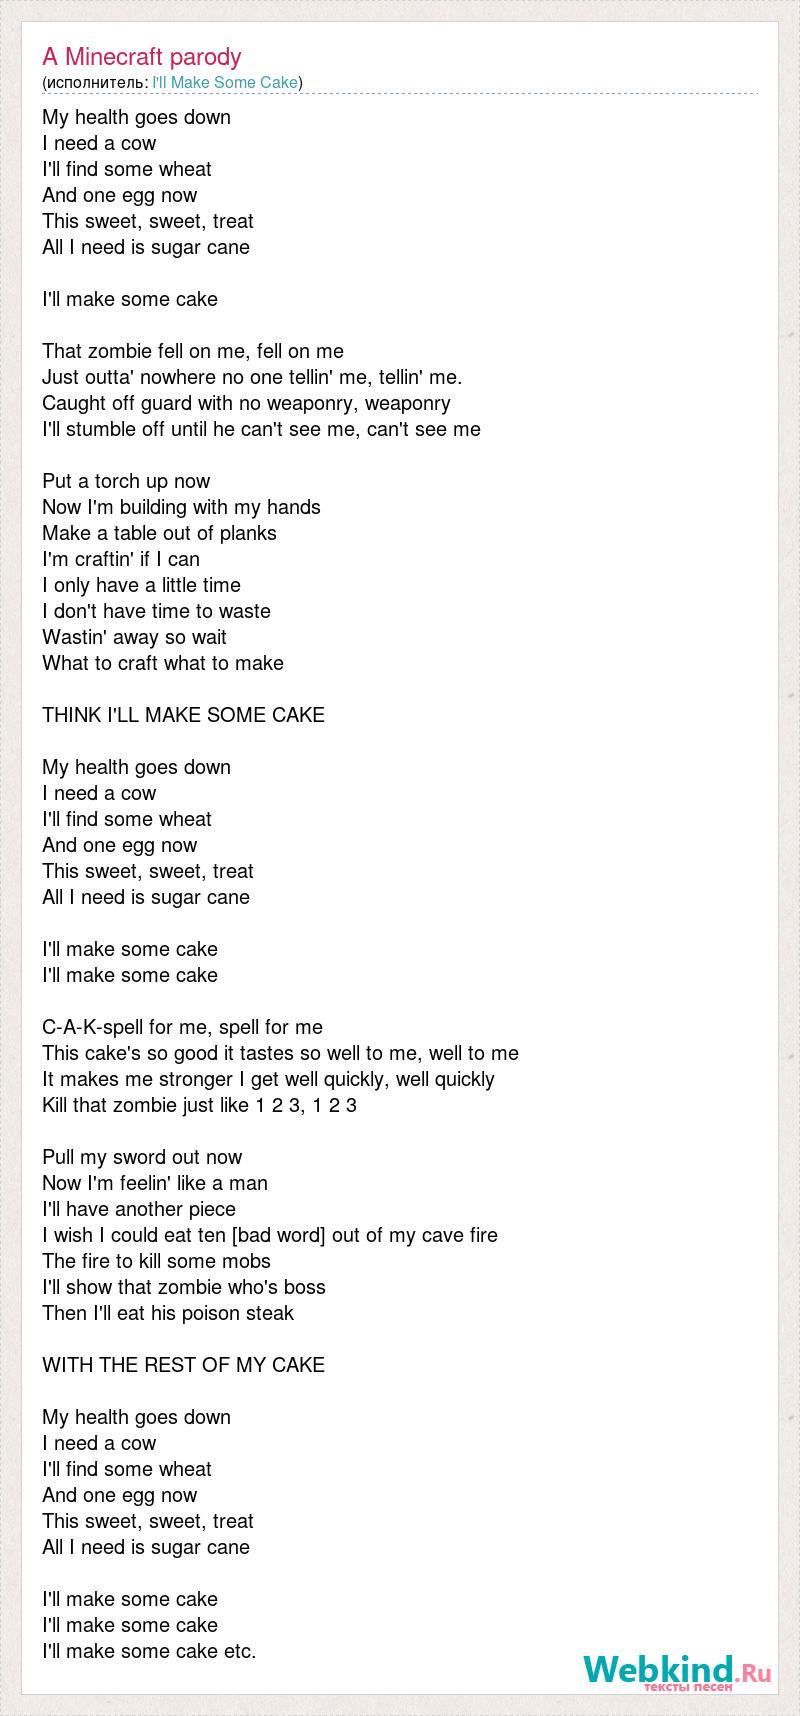 I'll Make Some Cake: A Minecraft parody слова песни